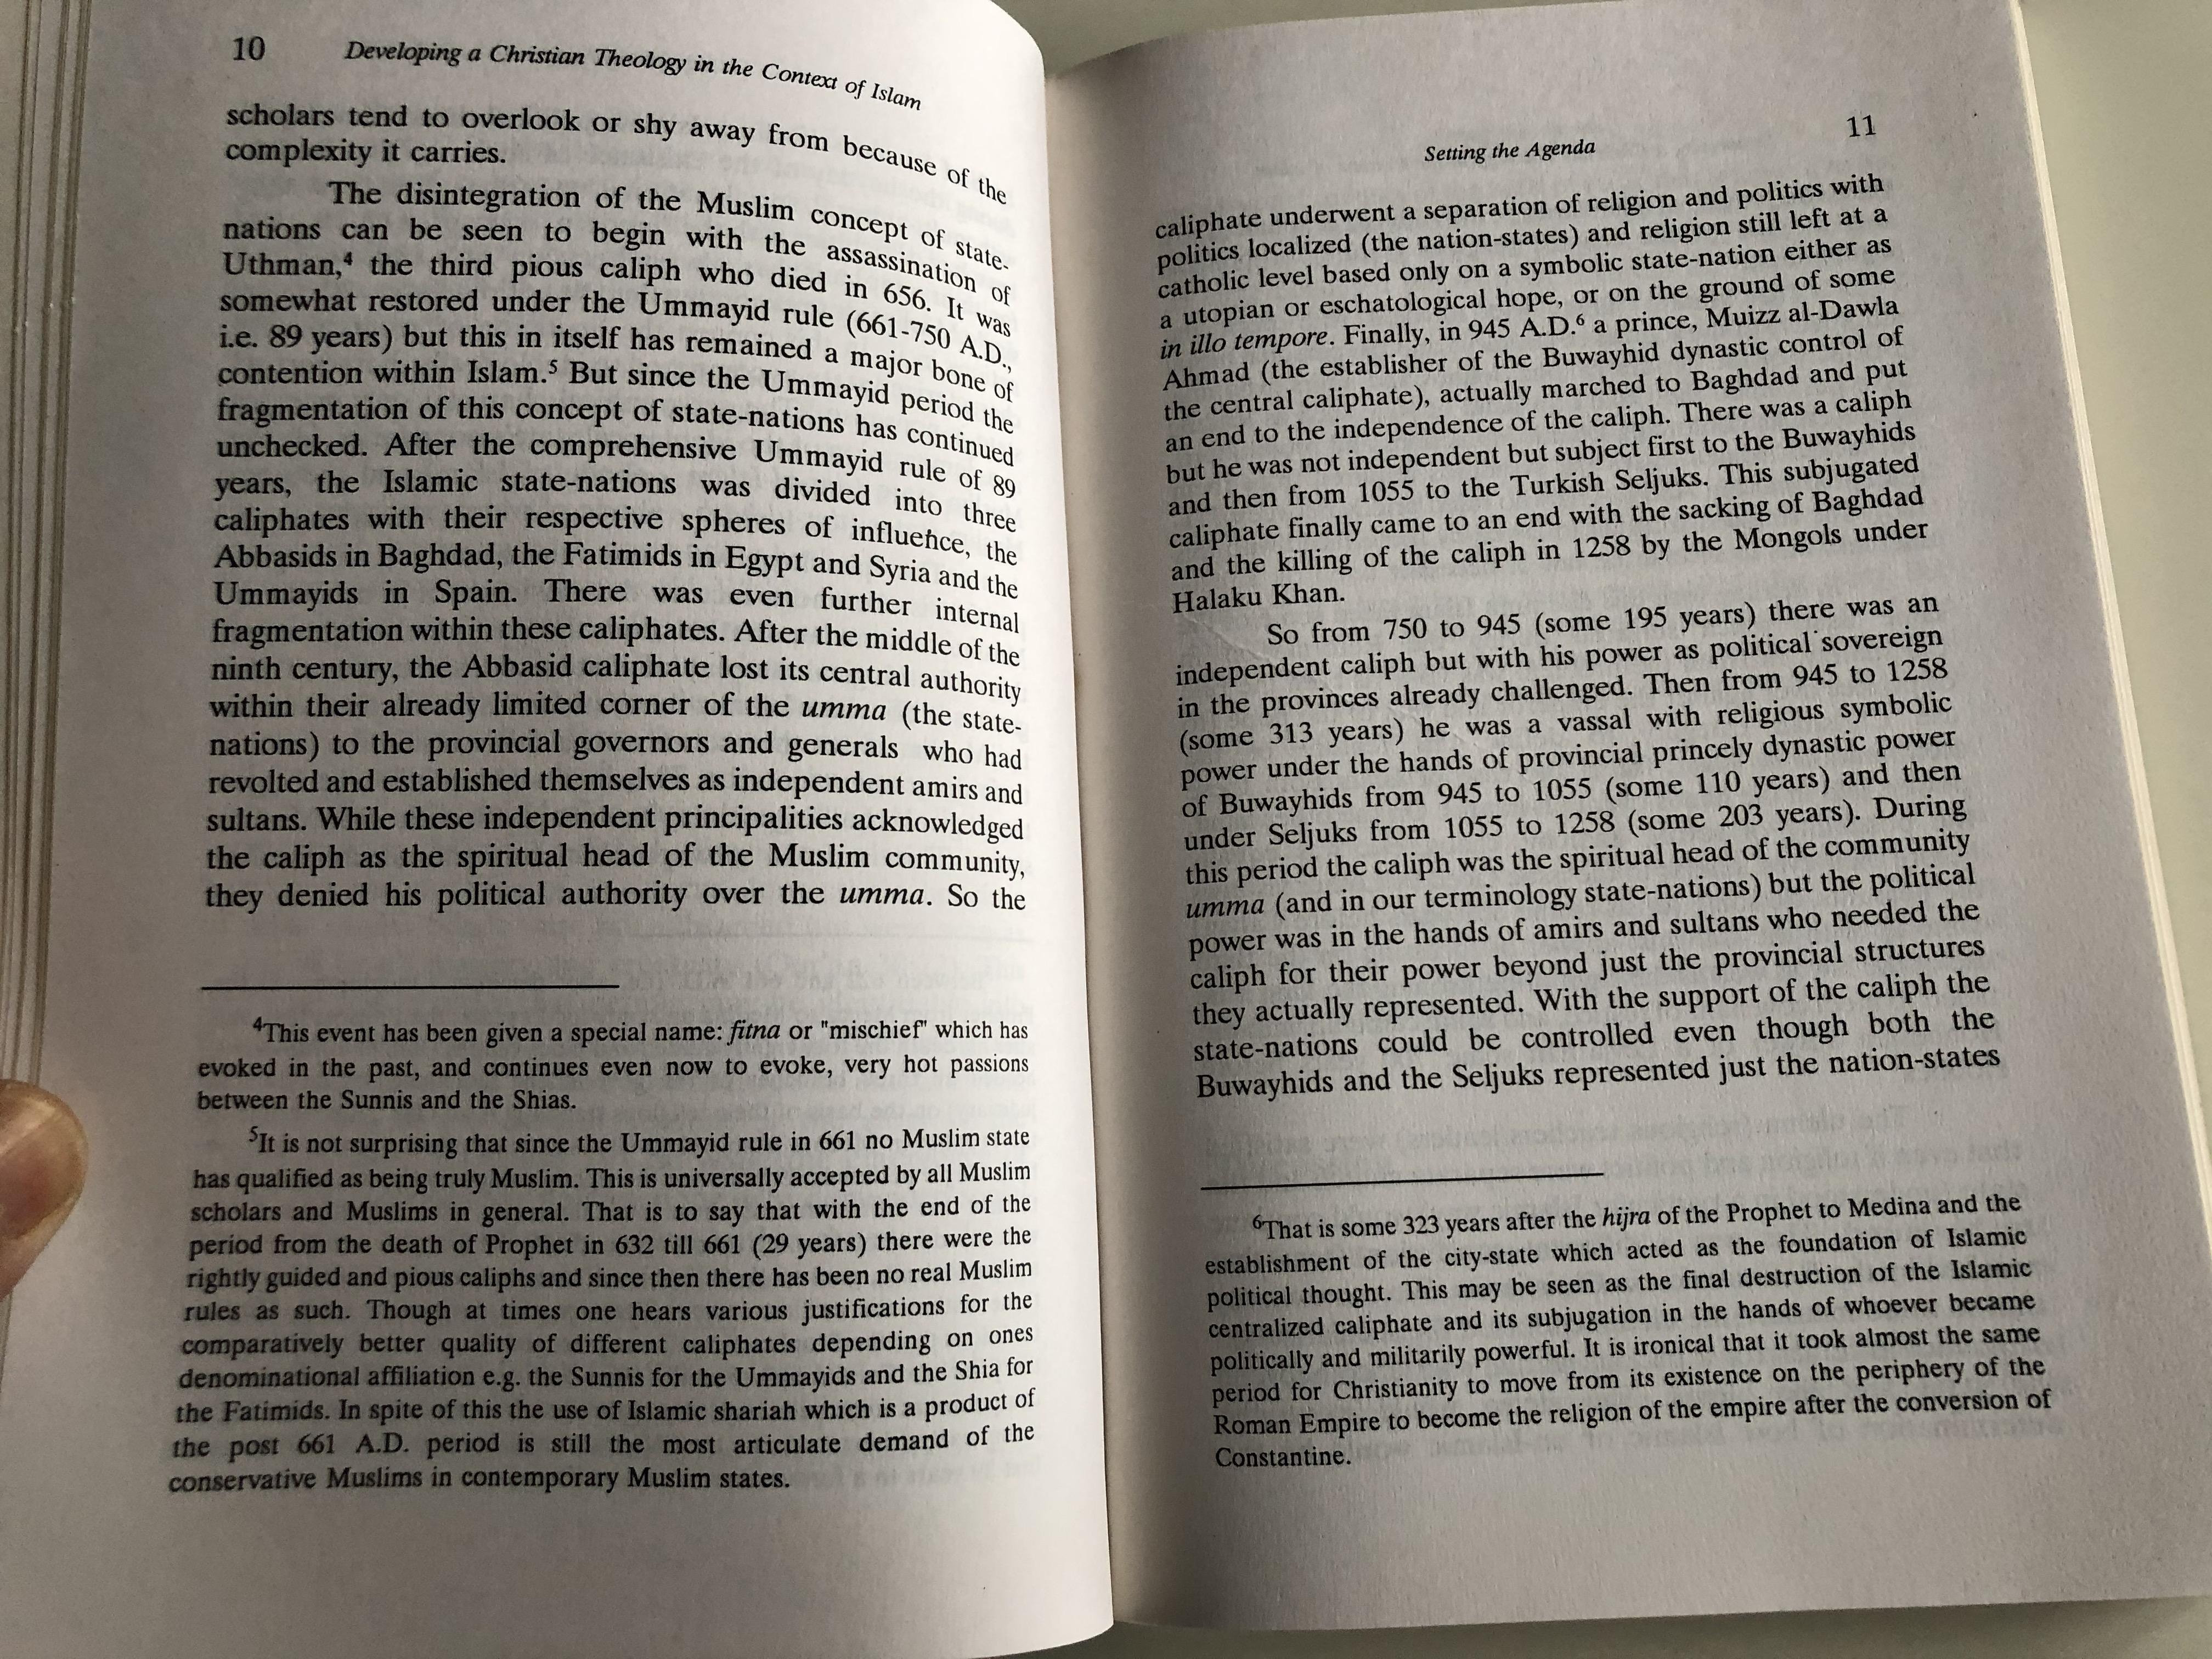 developing-christian-theology-in-the-context-of-islam-by-christine-amjad-ali-christian-study-centre-rawalpindi-1996-5-.jpg